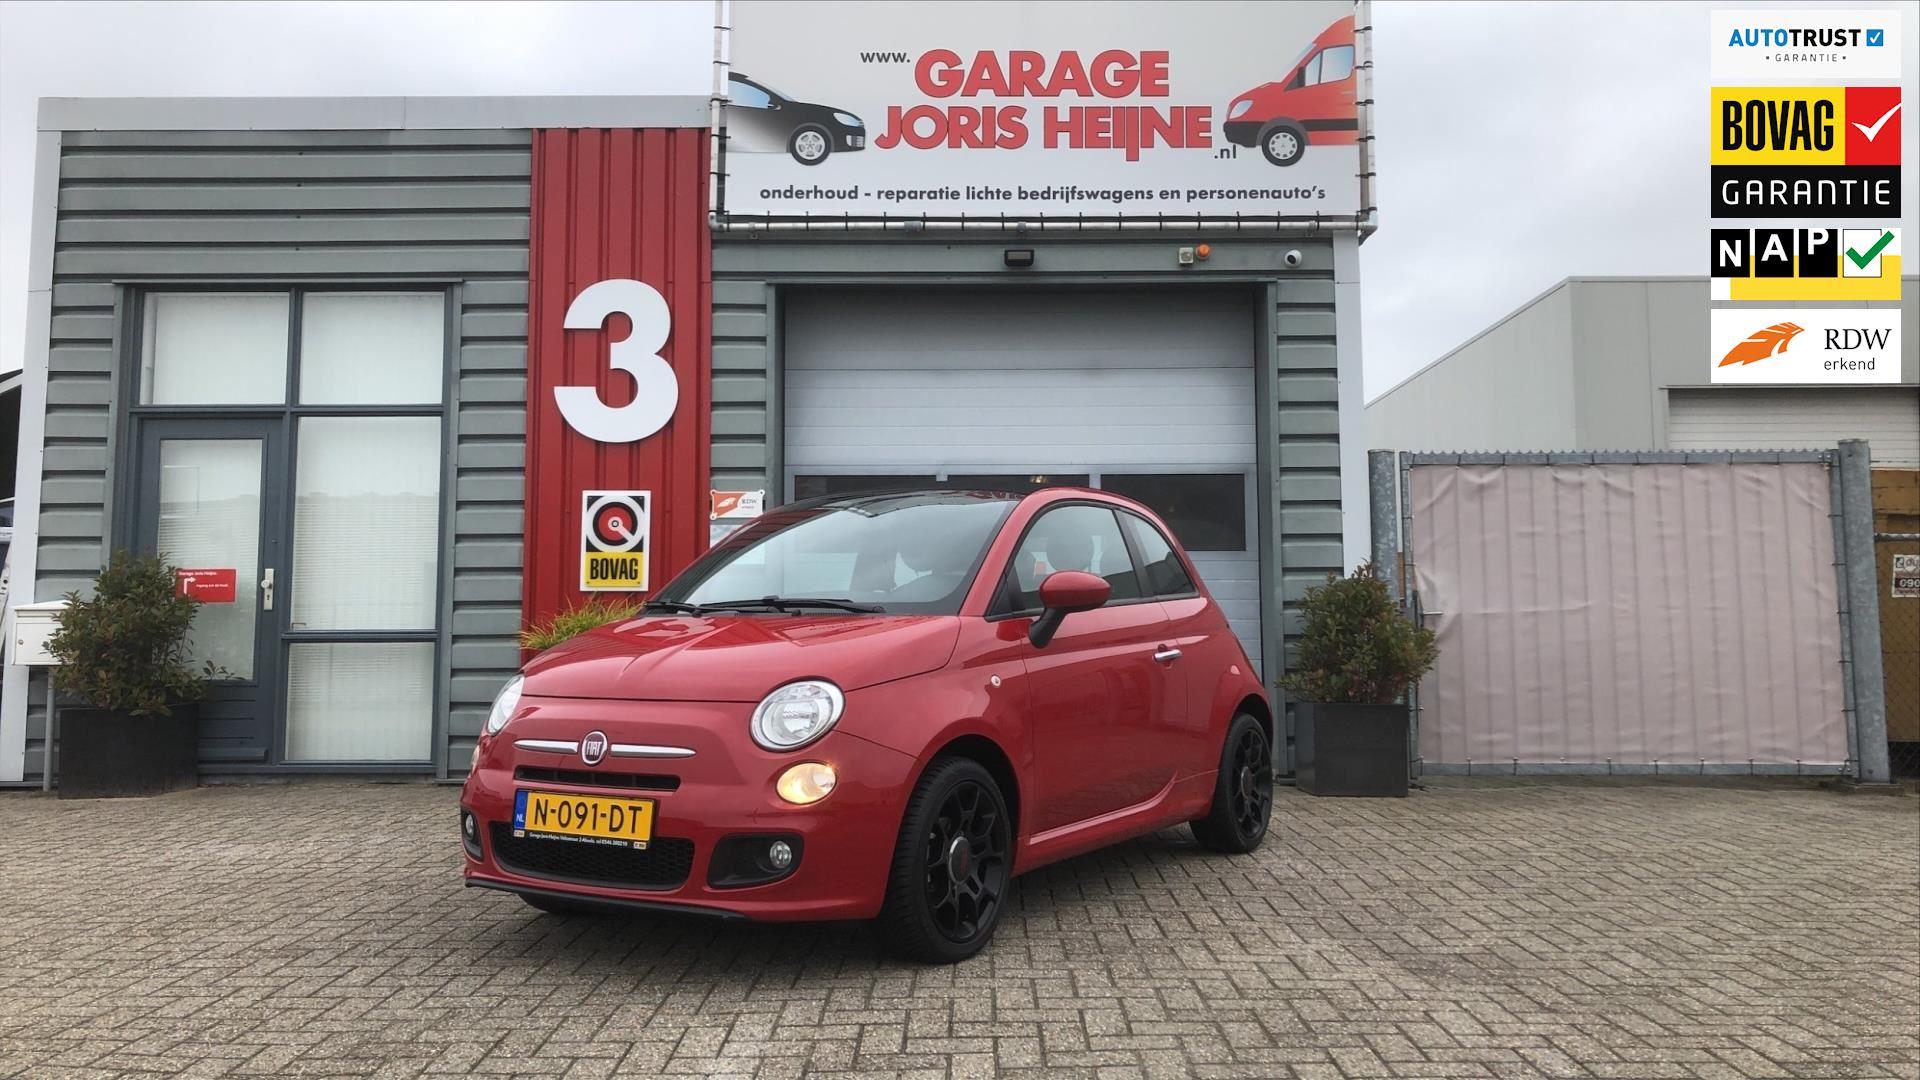 Fiat 500 C occasion - Garage Joris Heijne